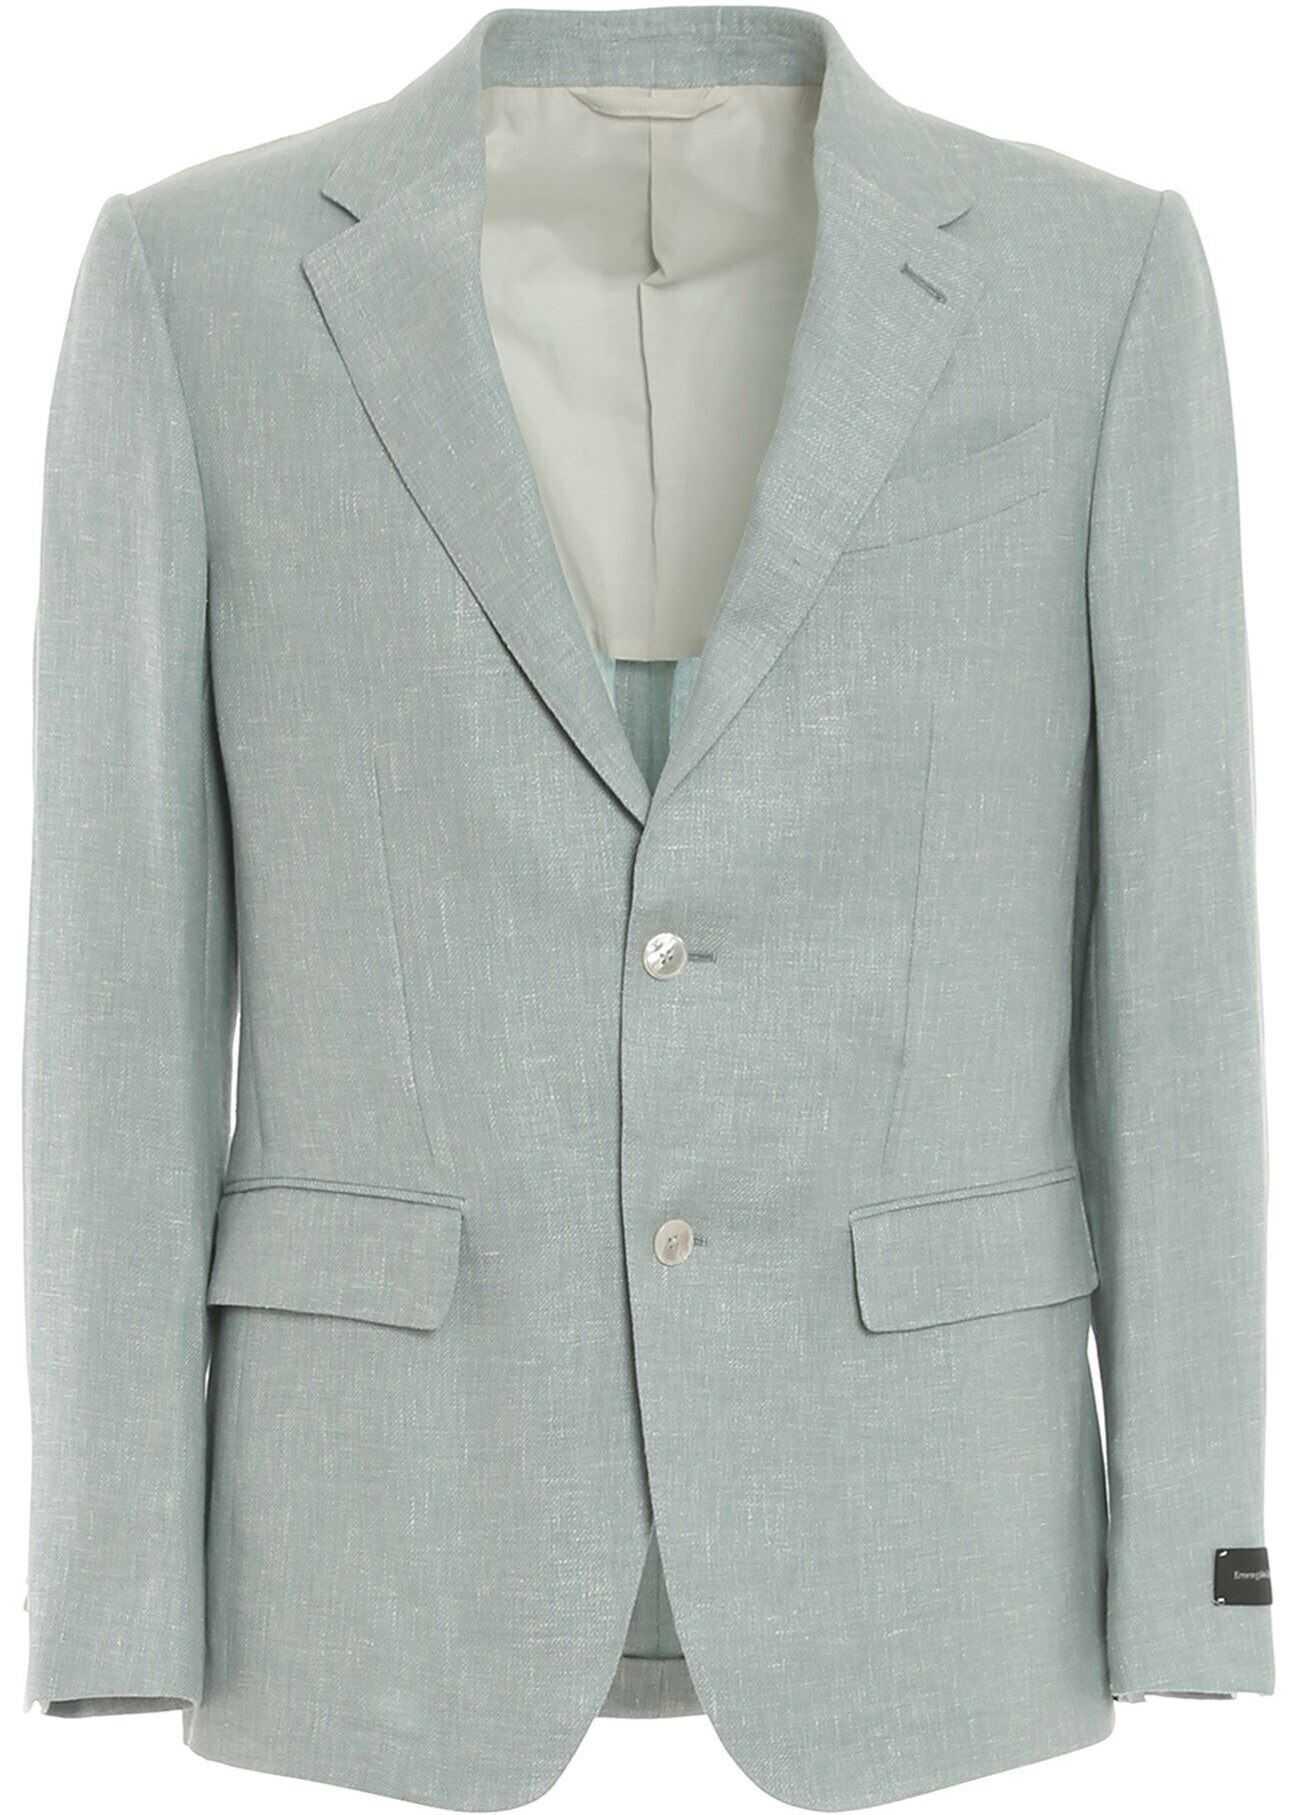 Ermenegildo Zegna Linen, Wool And Silk Blazer In Light Blue Light Blue imagine